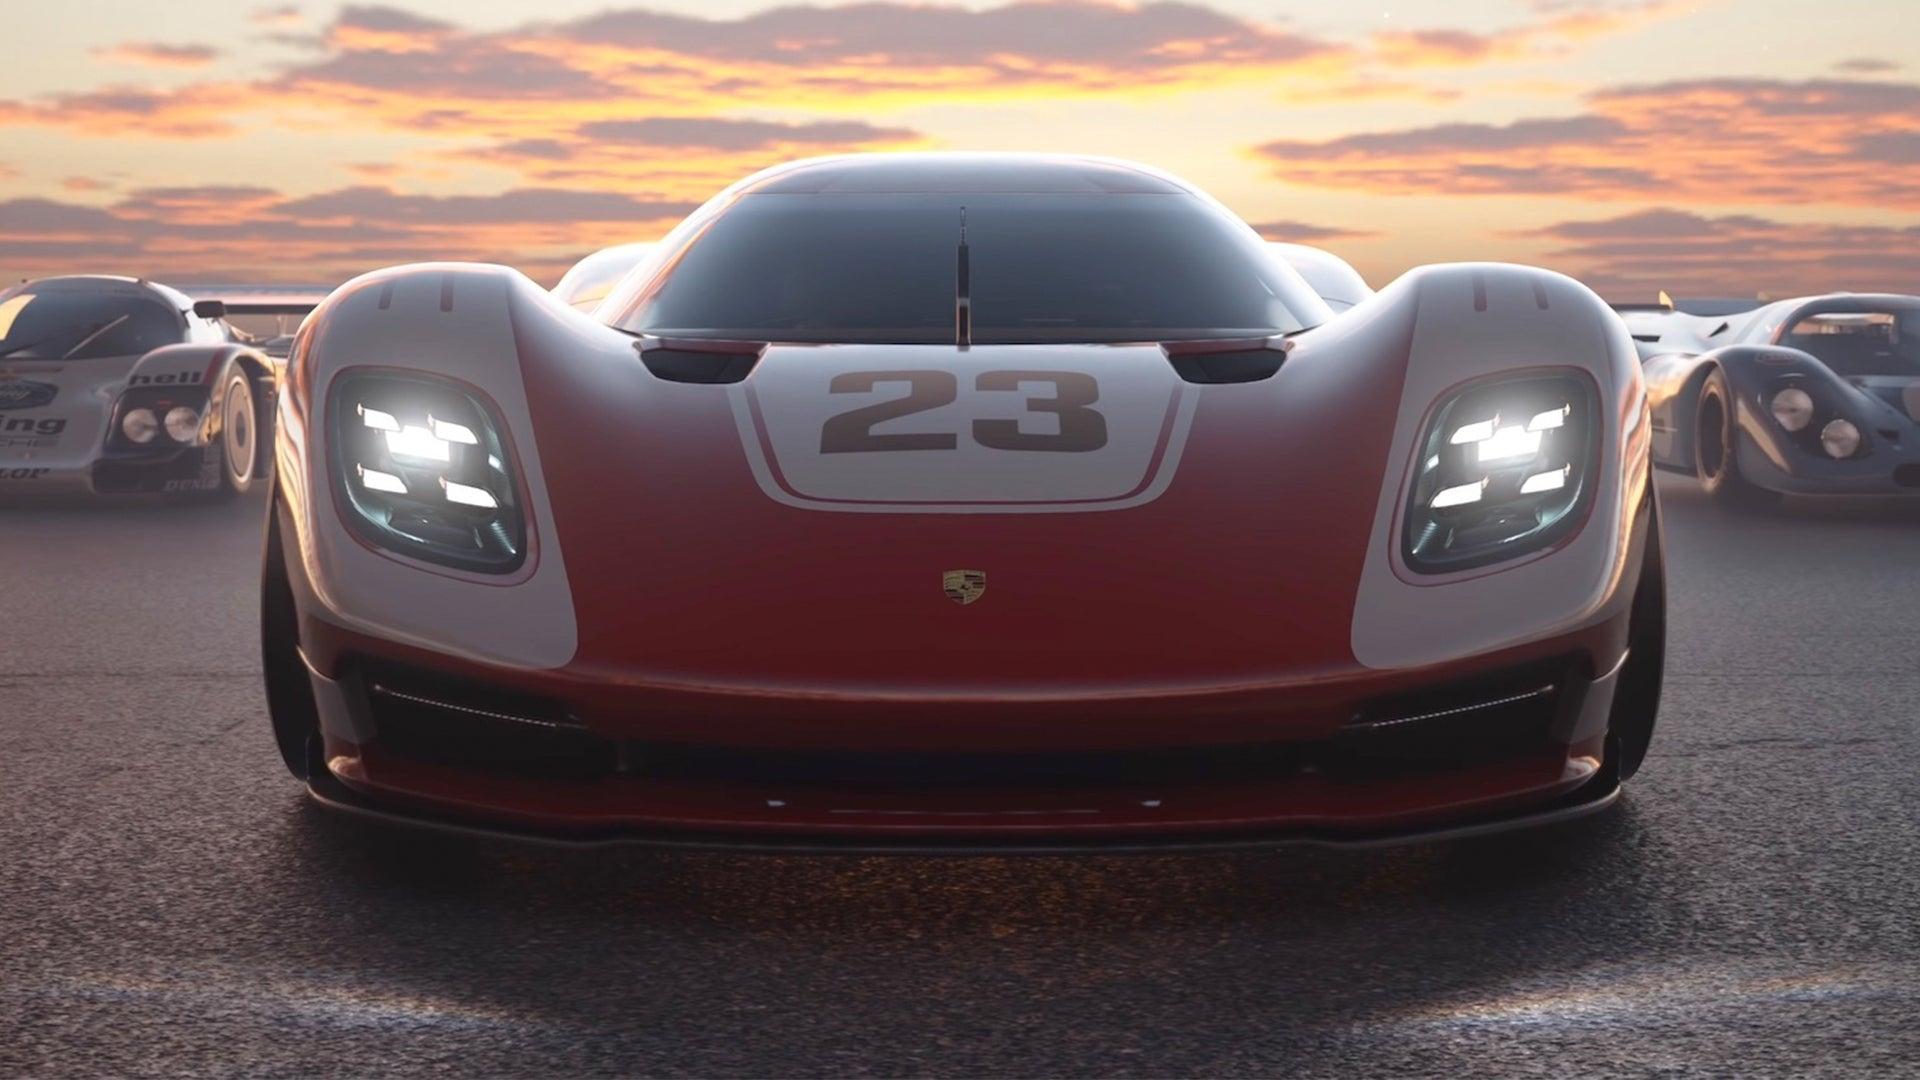 يتوفر Gran Turismo 7 على PS4 و PS5 في 4 مارس  🚀